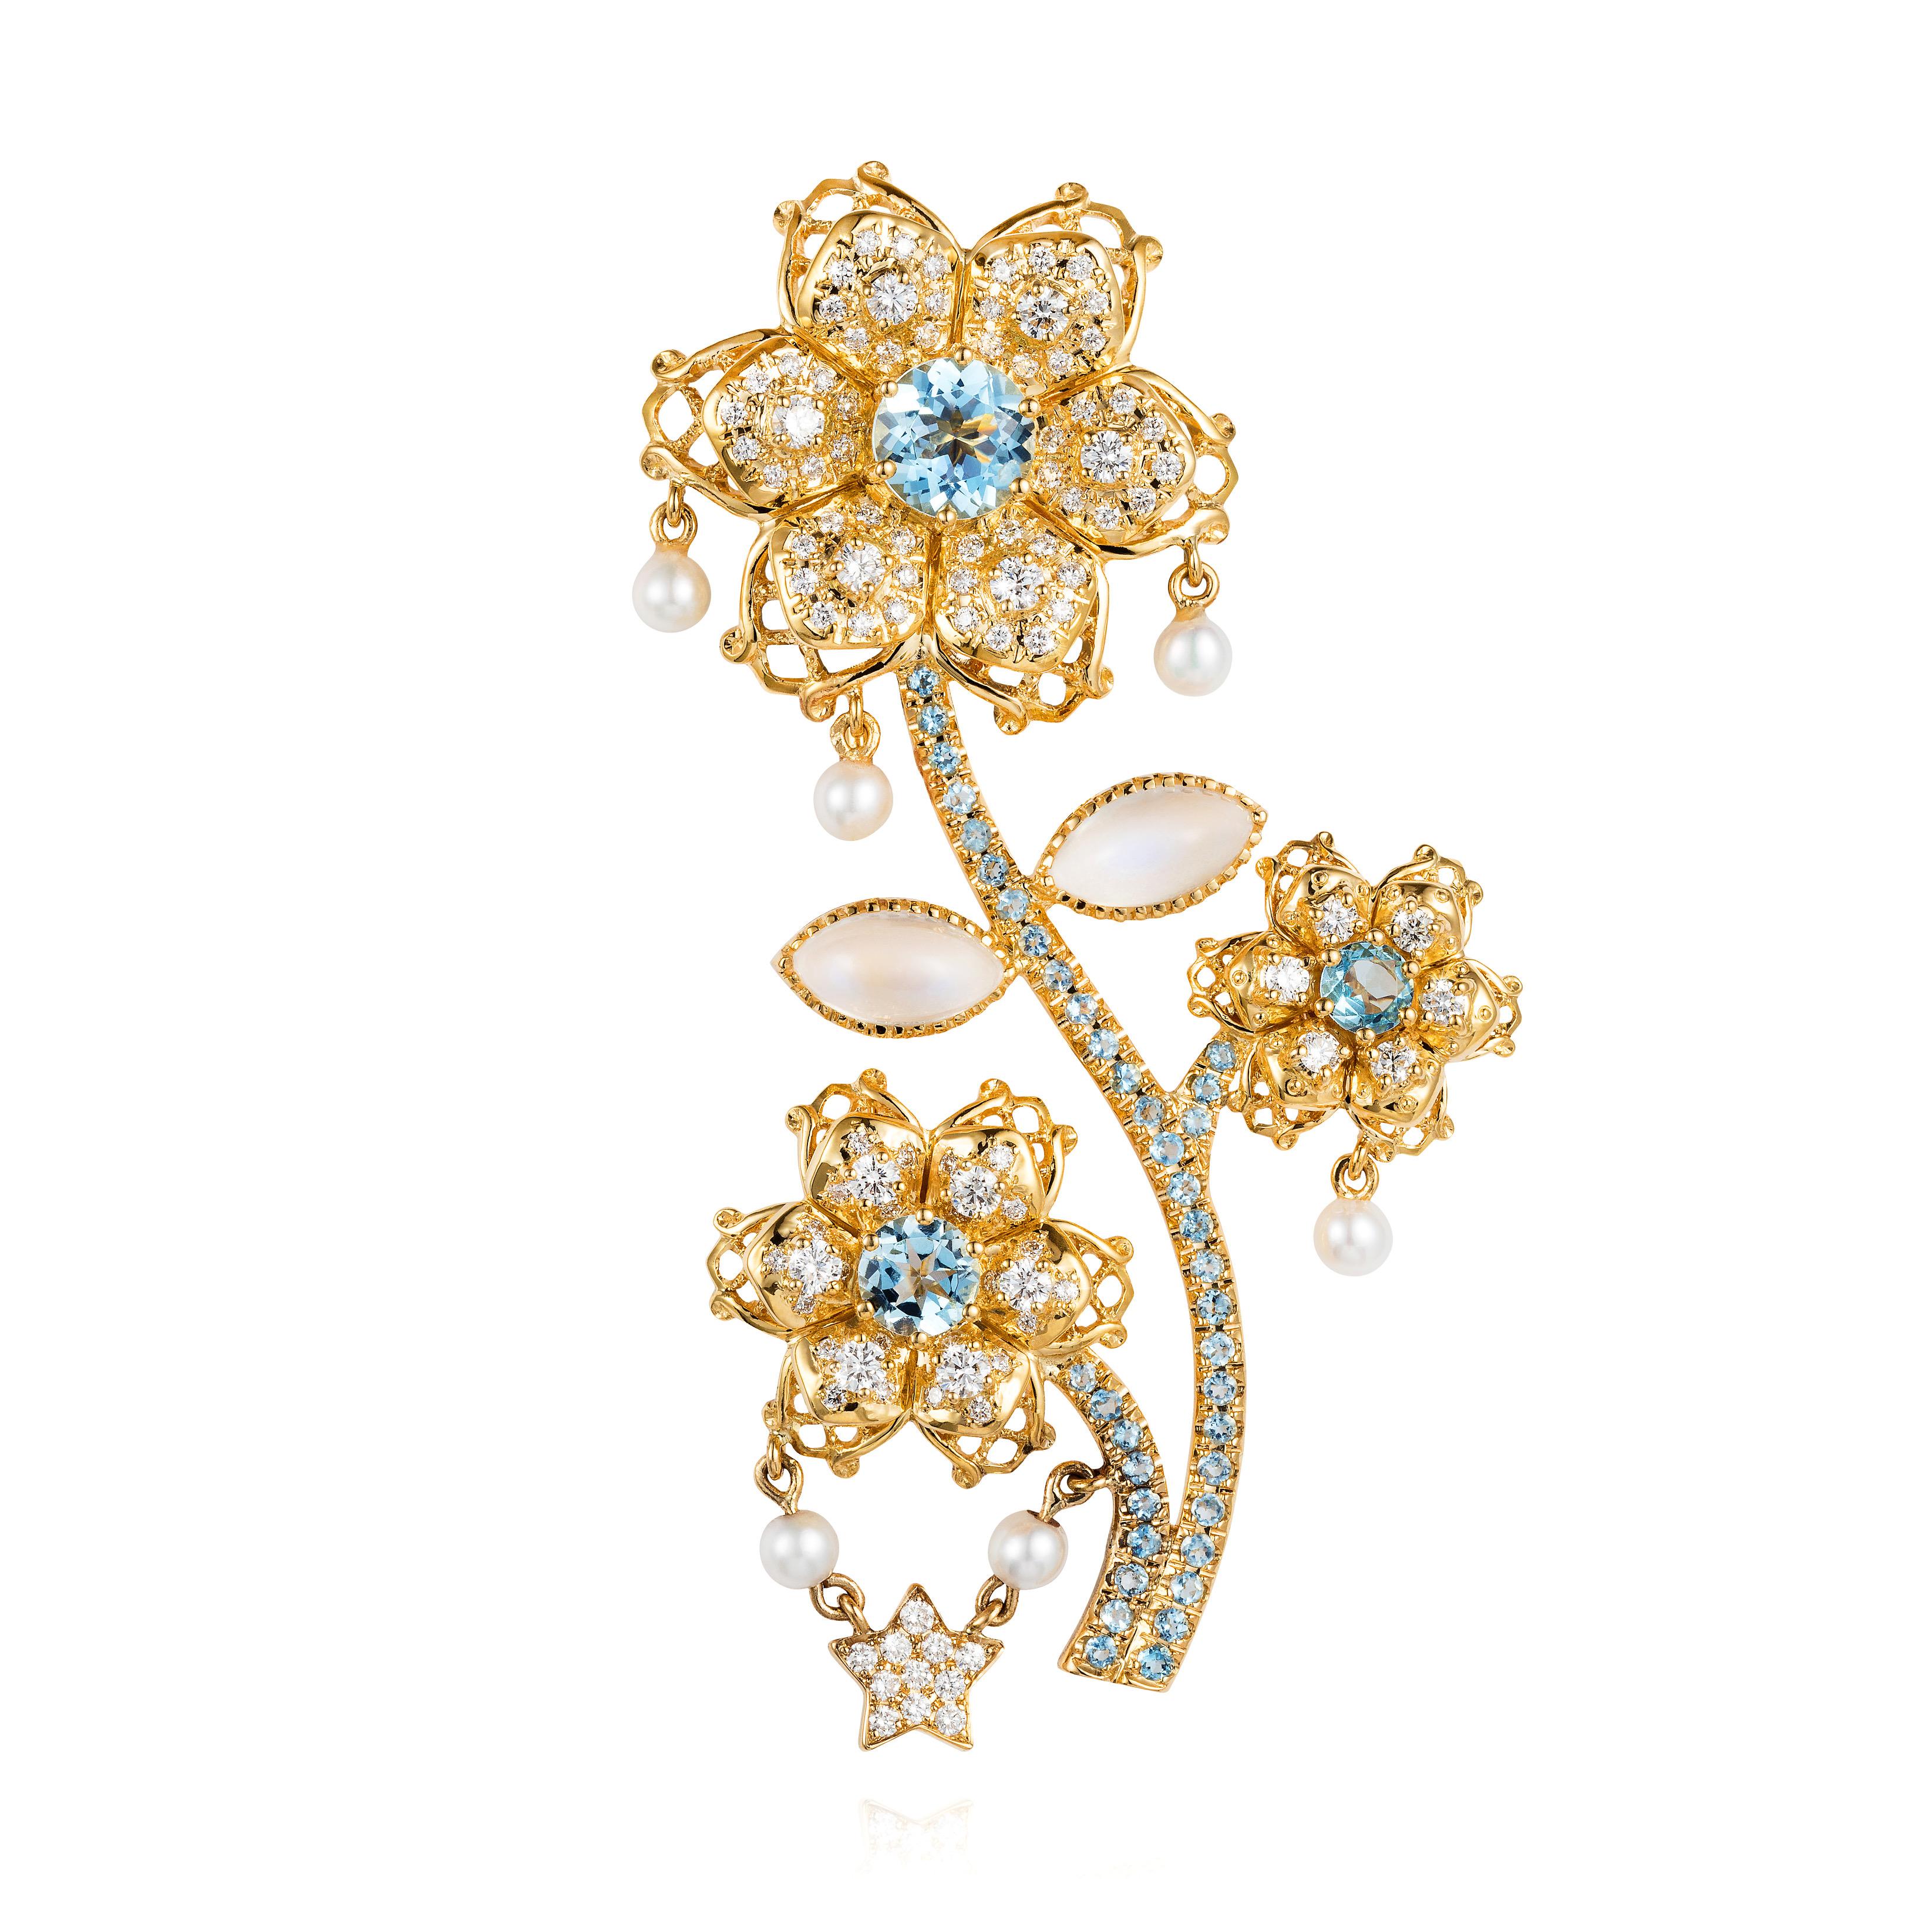 Aquamarine, Moonstone, Diamond And Baby Pearl Brooch 18k Gold